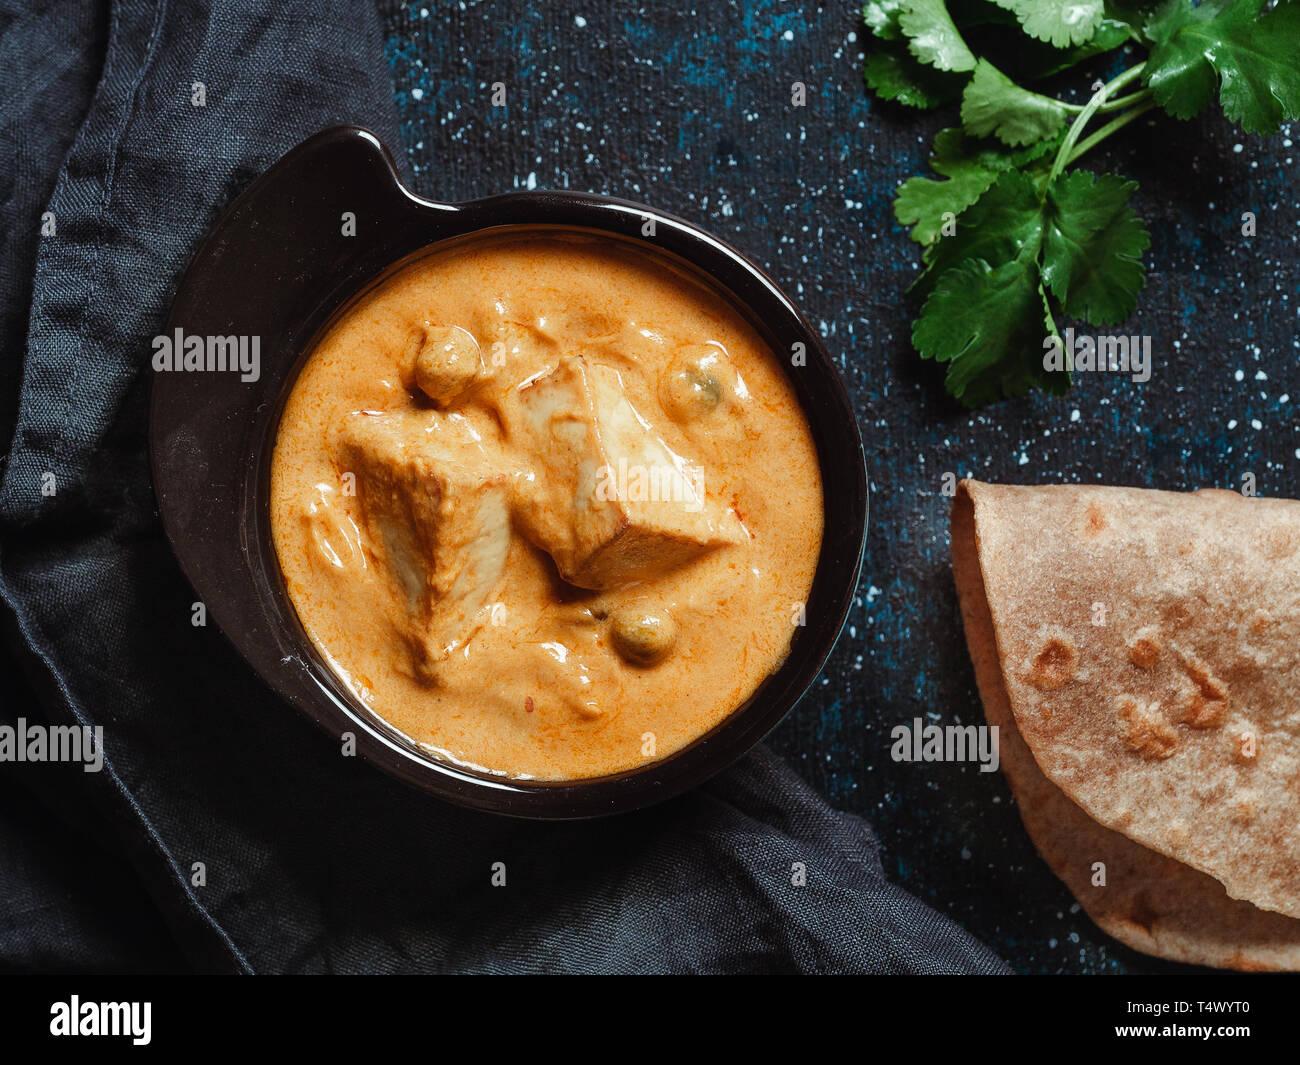 Pakistani Curries Stock Photos & Pakistani Curries Stock Images - Alamy